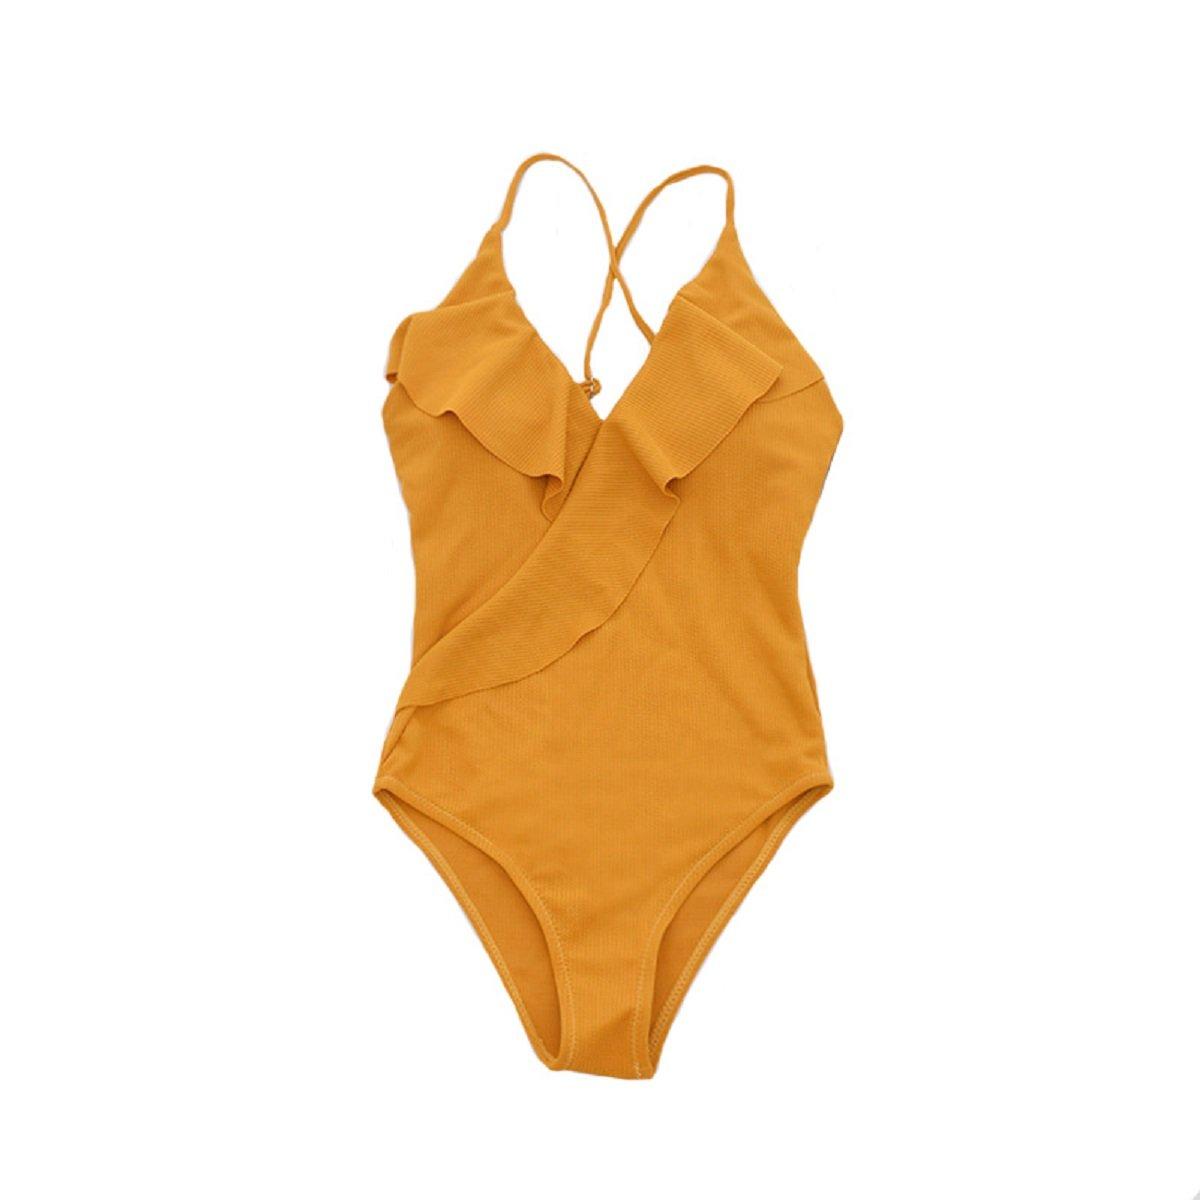 5bde0d5bb70 Rainoop Women's Solid Sexy Off Shoulder Backless Ruffles One Piece Swimsuit  Beach Swimwear Bathing Suit at Amazon Women's Clothing store: